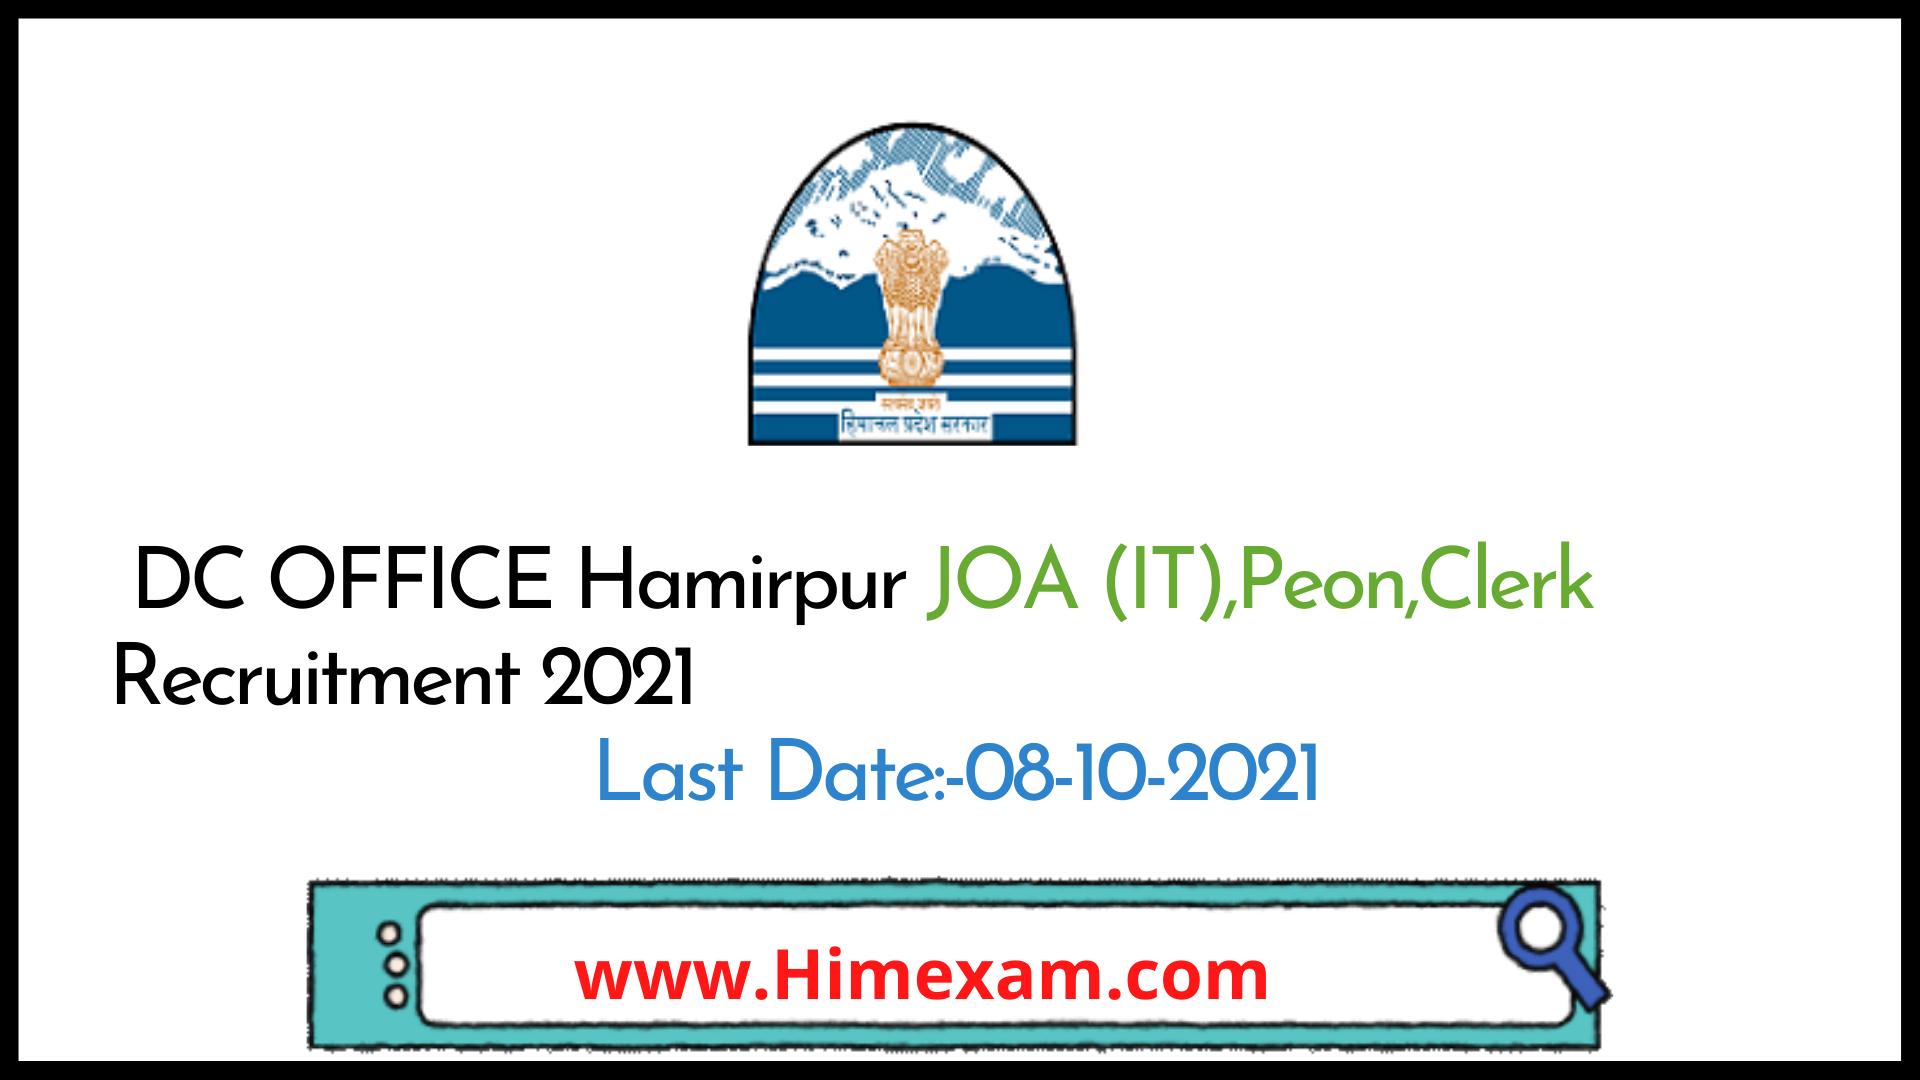 DC OFFICE Hamirpur JOA (IT),Peon,Clerk Recruitment 2021